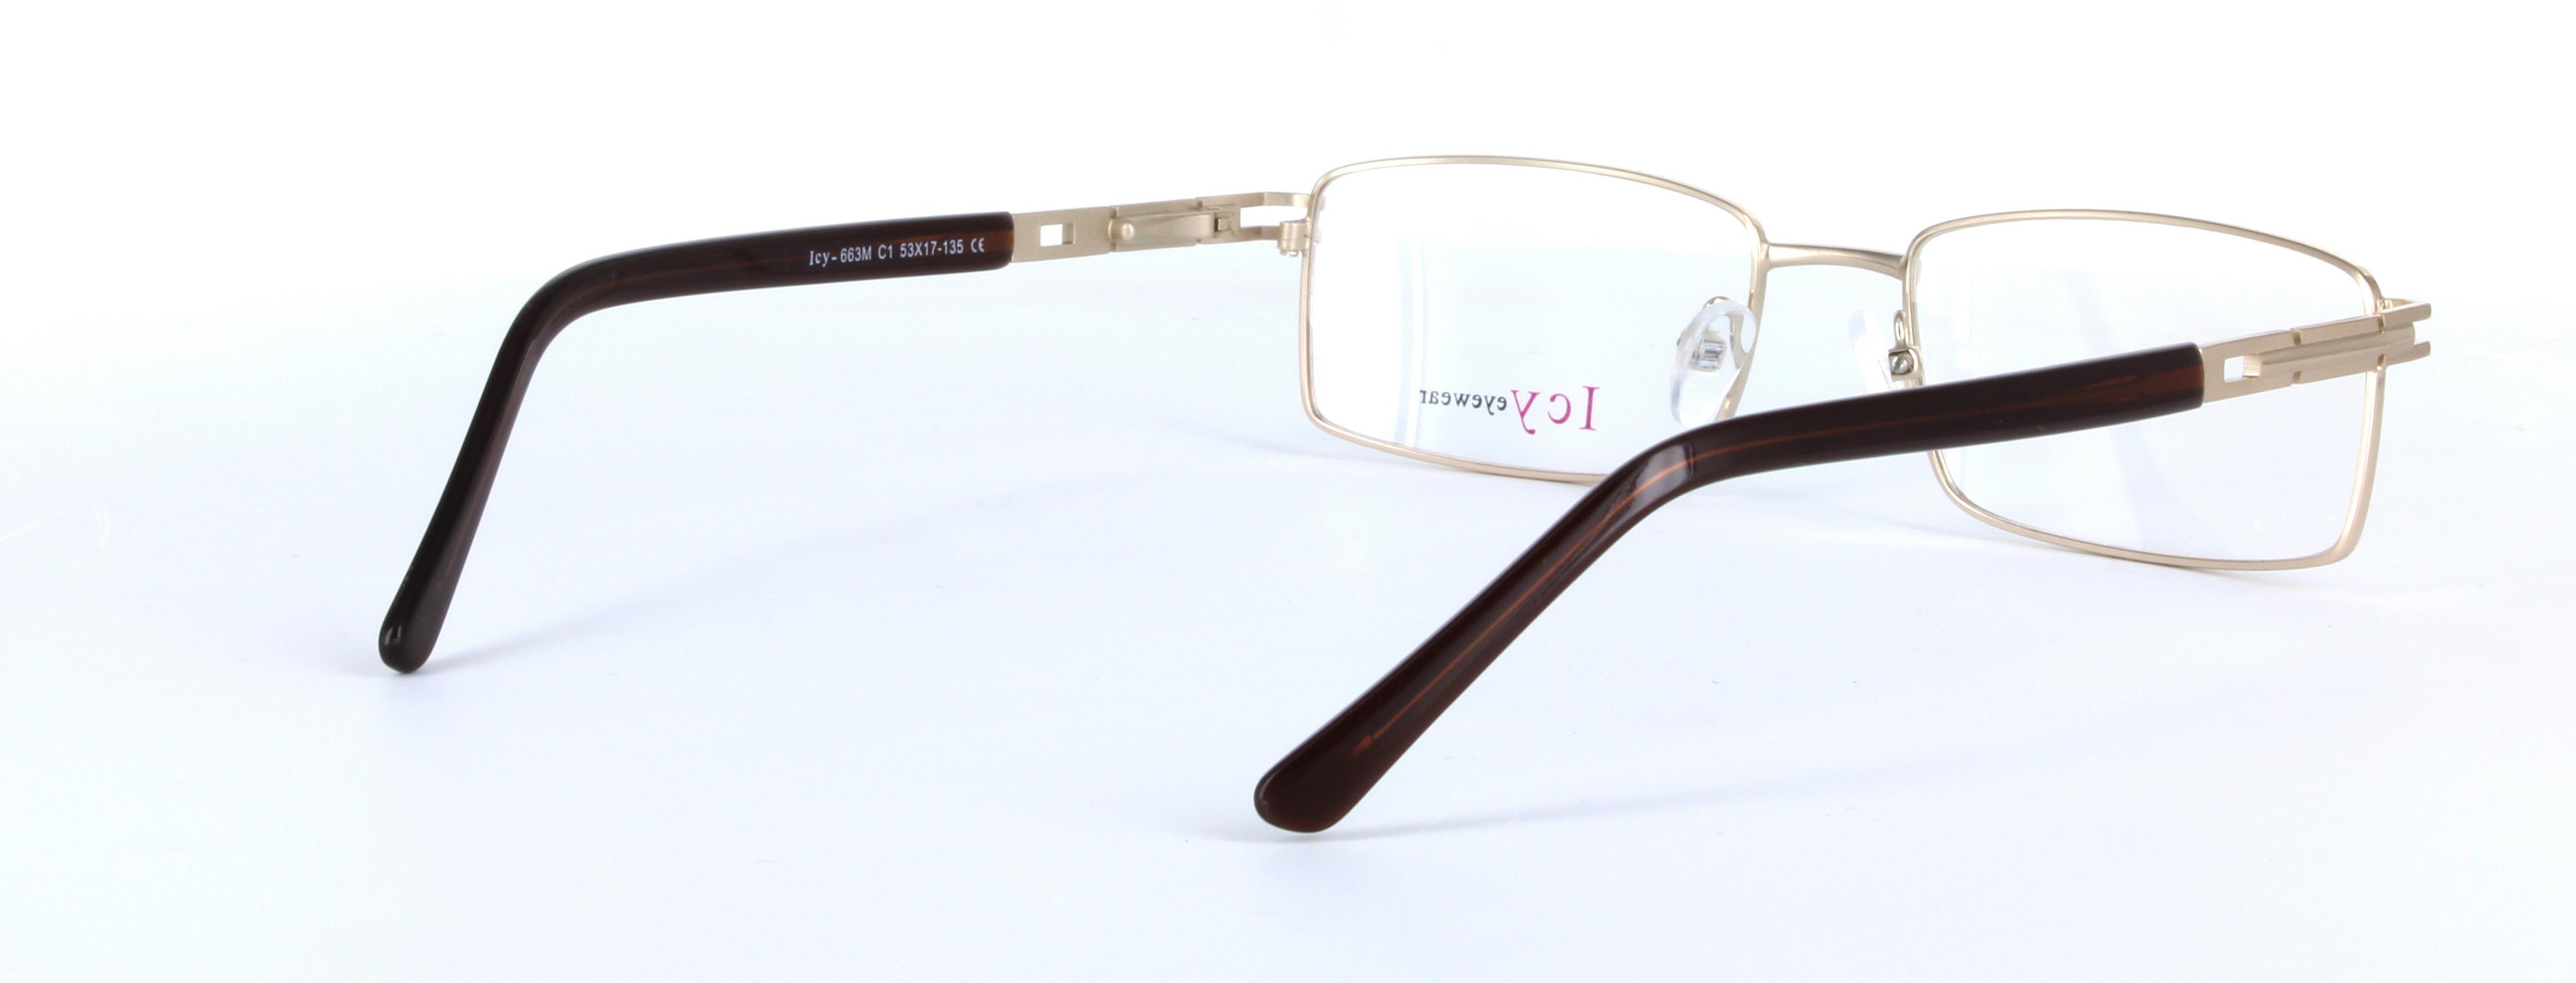 1b52d6eb0c1 Robin - Classic Metal Unisex Prescription Glasses - Gold